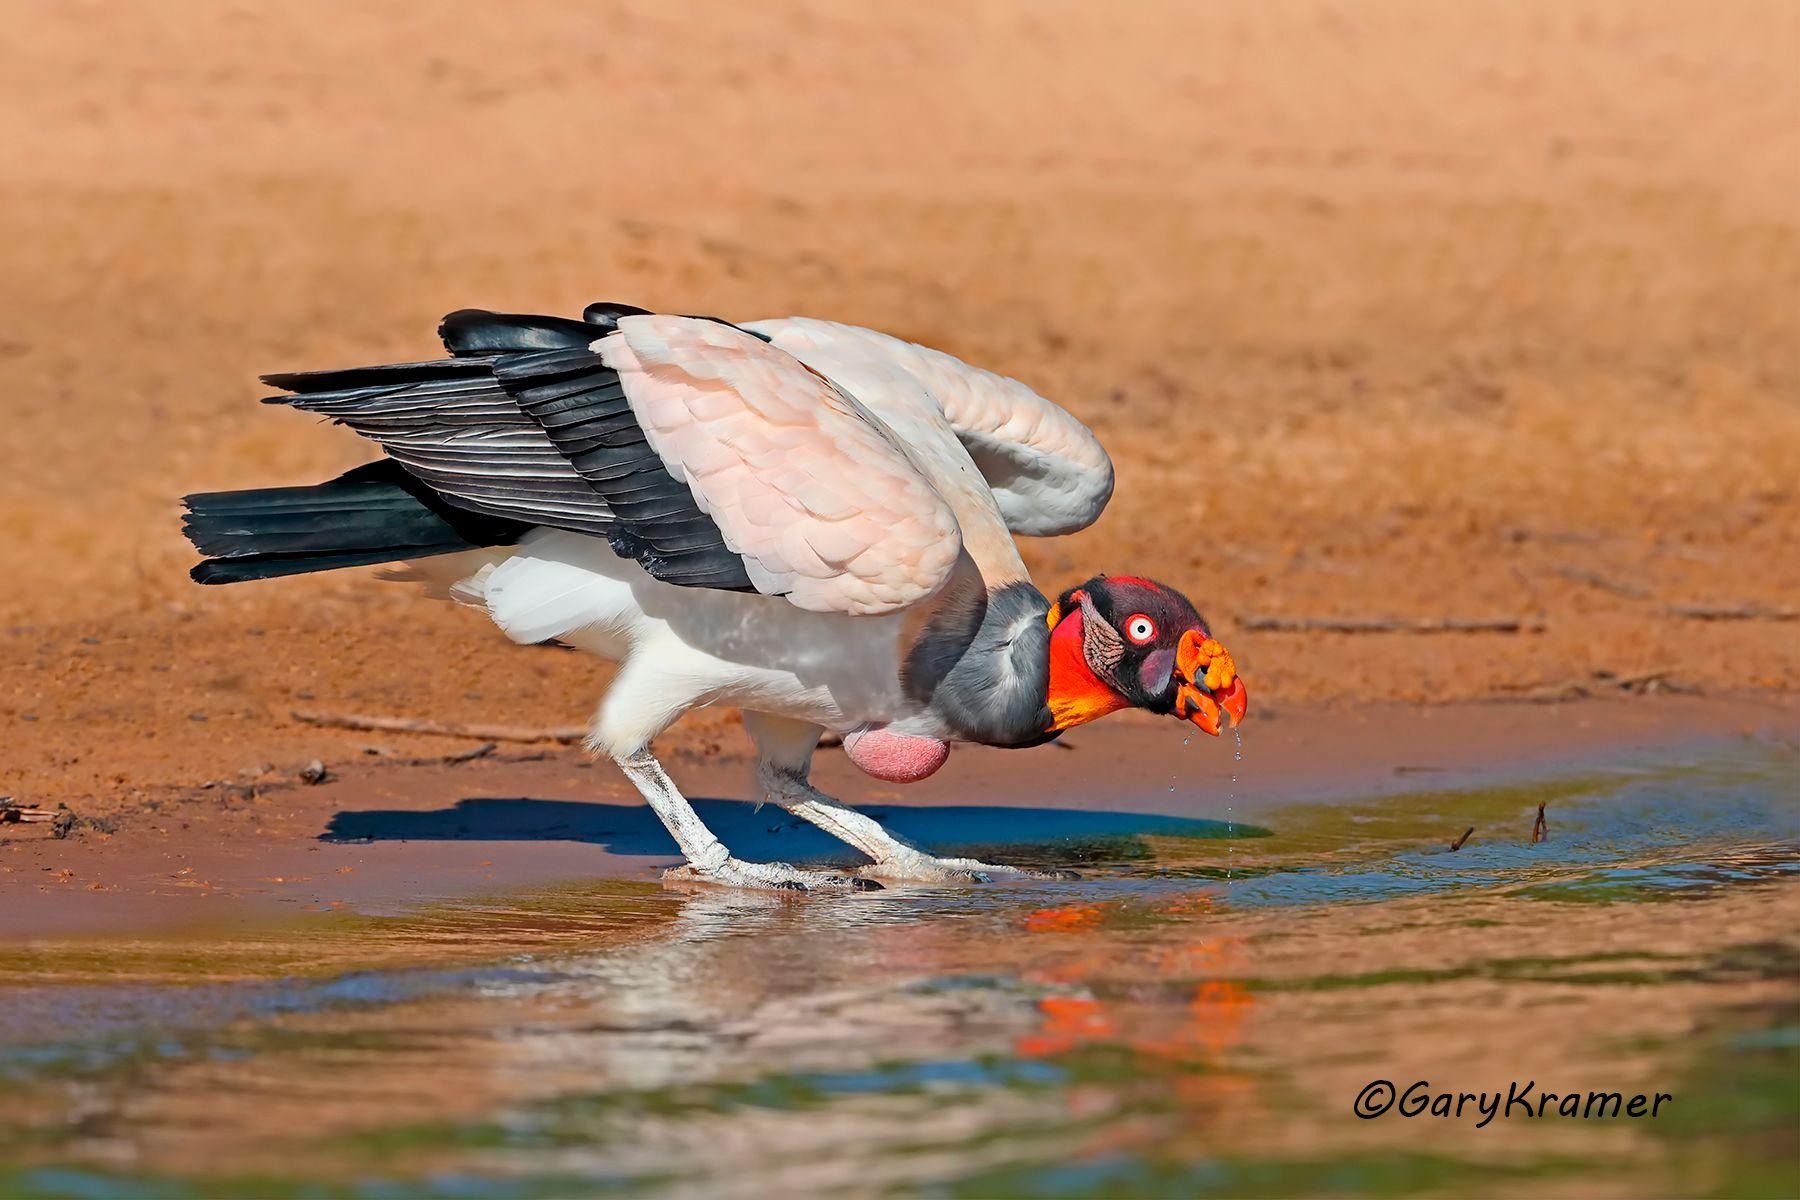 King Vulture (Sarcoramphus papa) - SBVk#036d